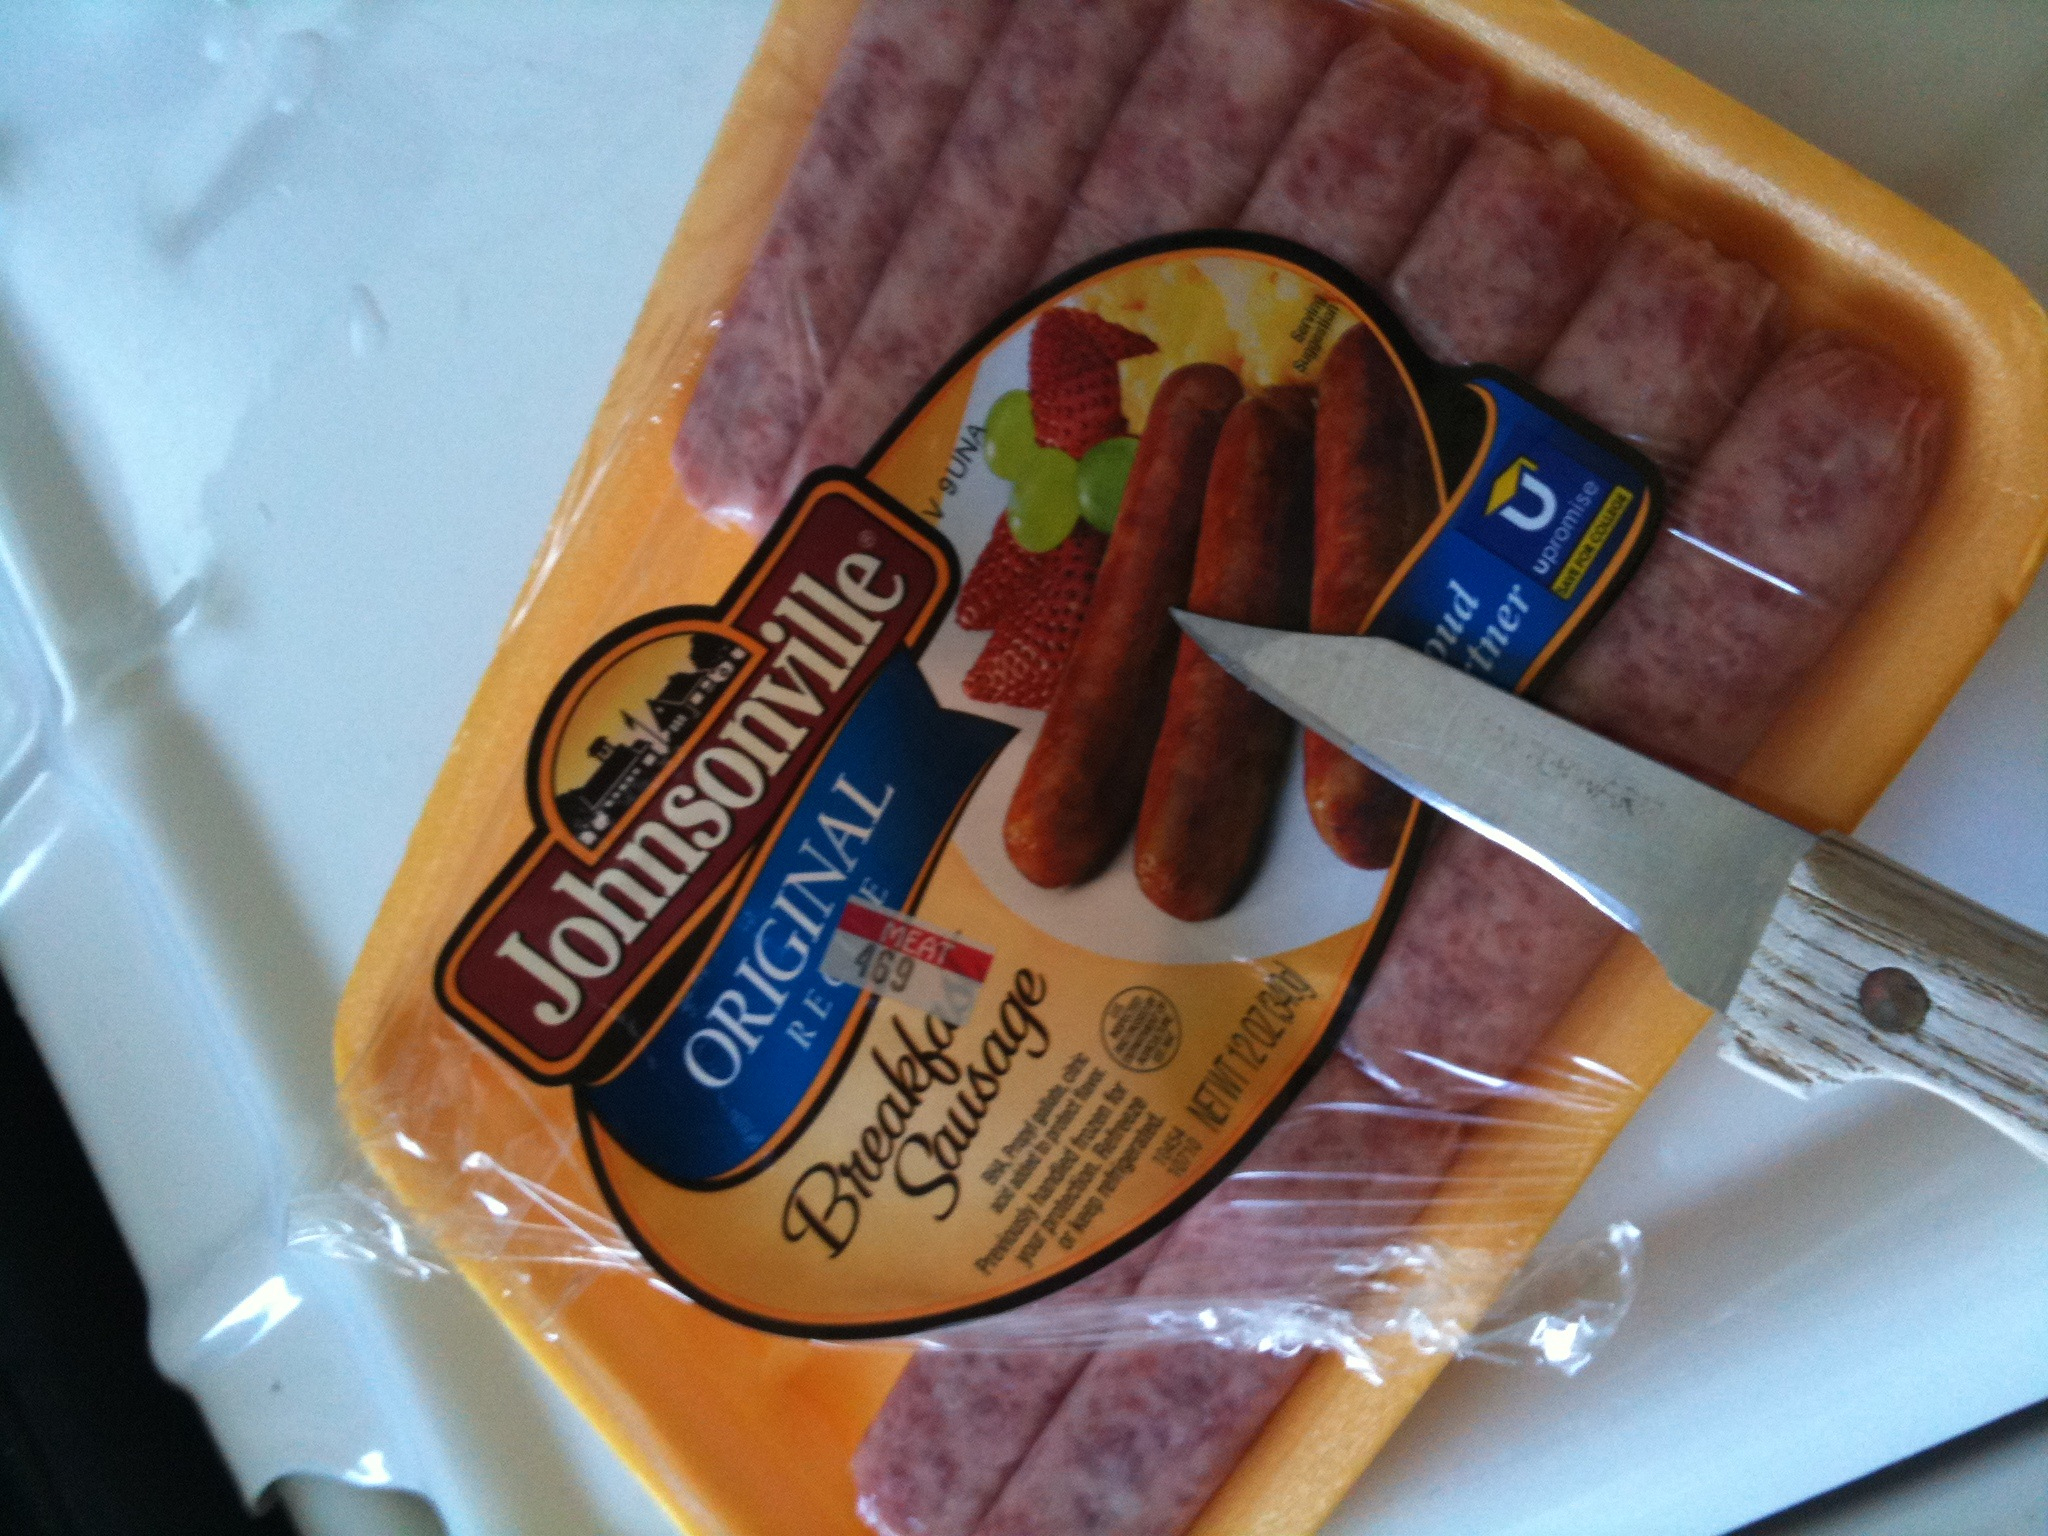 Oscar Meyer Cheese Filled Hot Dog